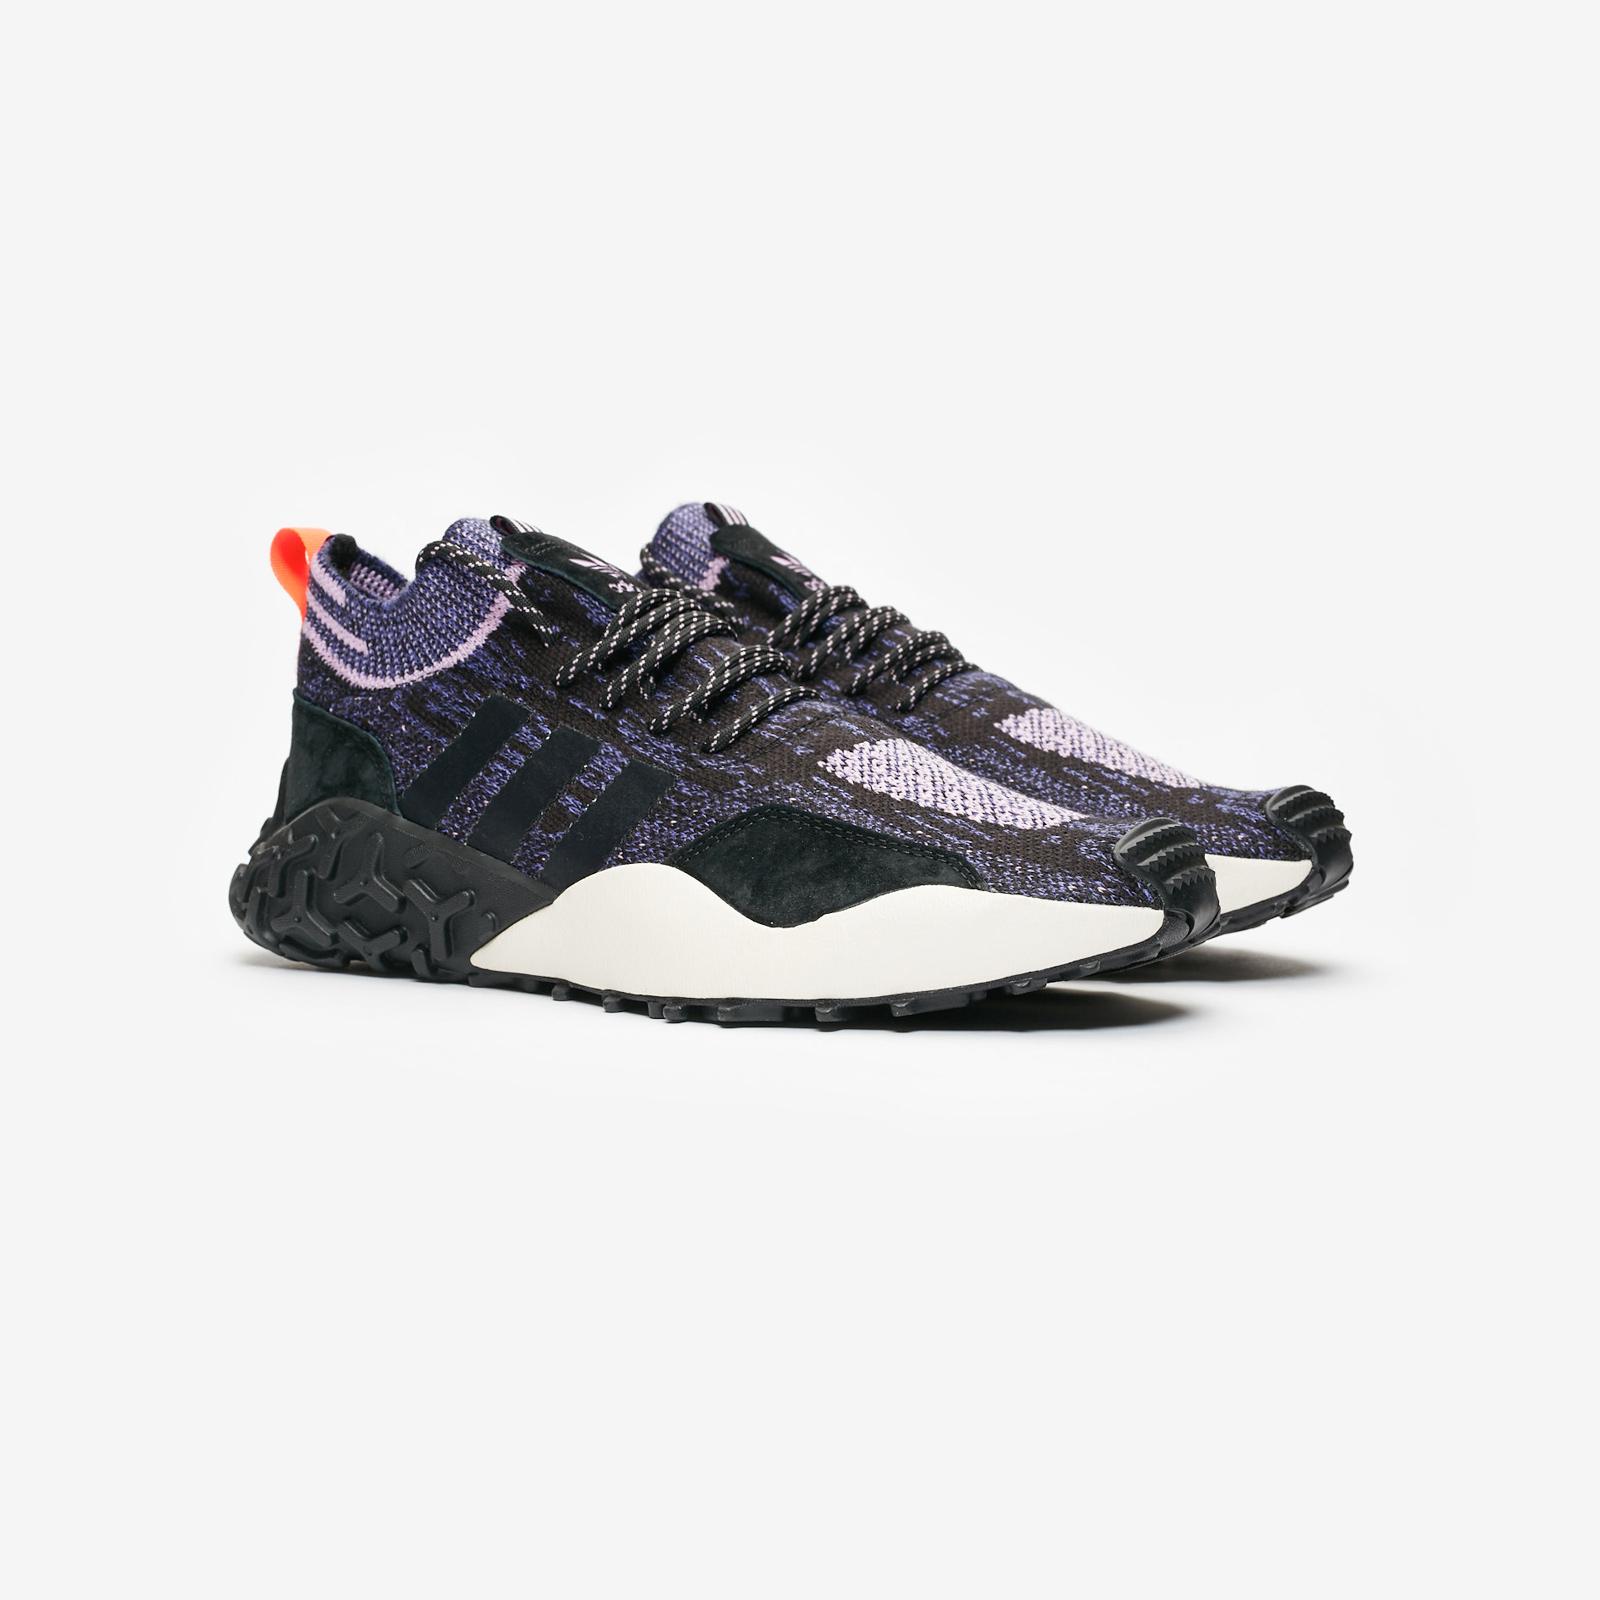 B41739 F2 Sneakersamp; I Tr Sneakersnstuff Streetwear Adidas Pk 1c3KJlFT